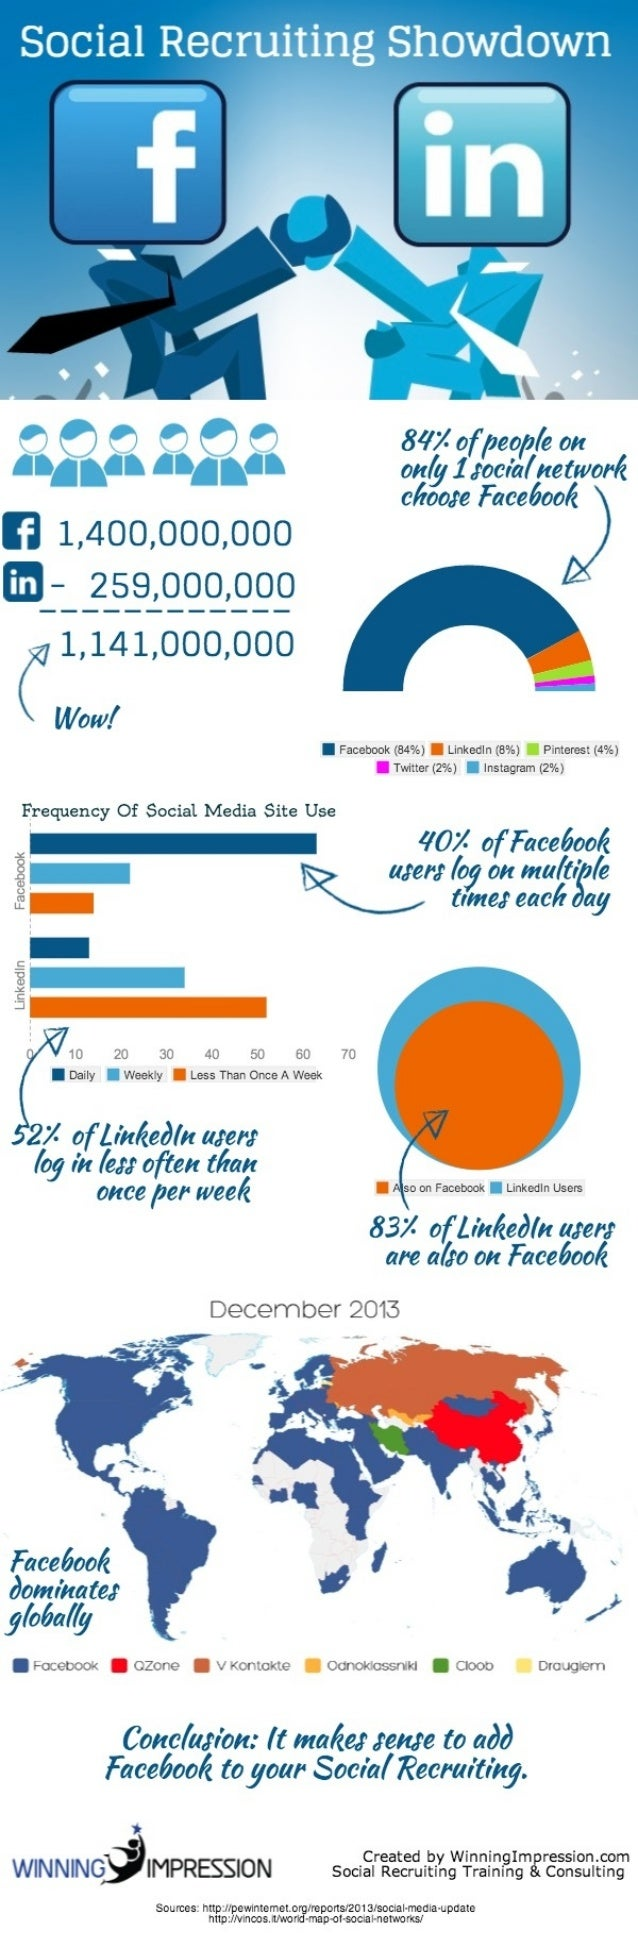 Social Recruiting Showdown: Facebook vs LinkedIn [Infographic]